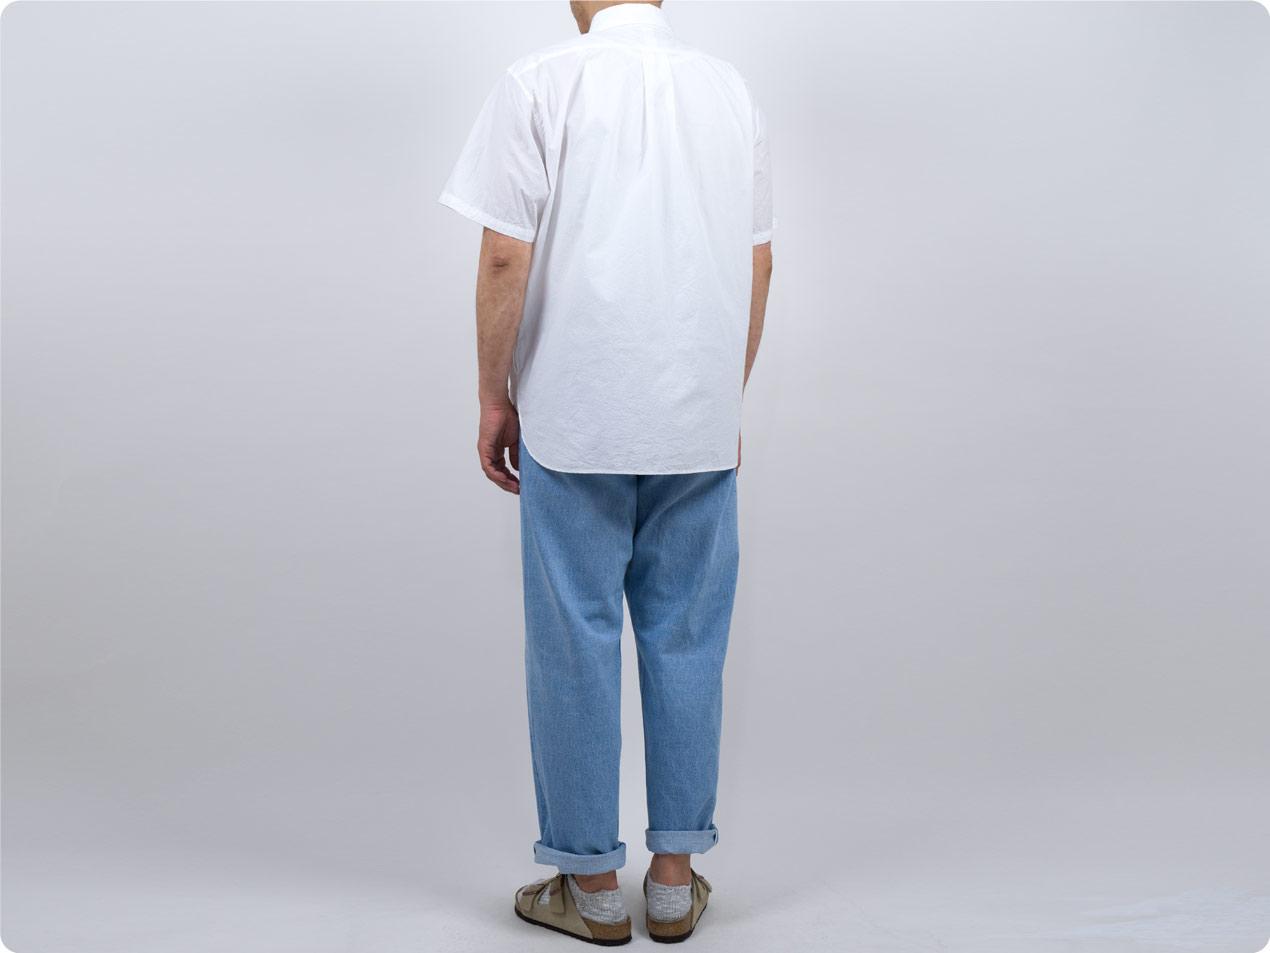 YAECA デニム ワイドストレート 13-13U LIGHT BLUE 〔メンズ〕